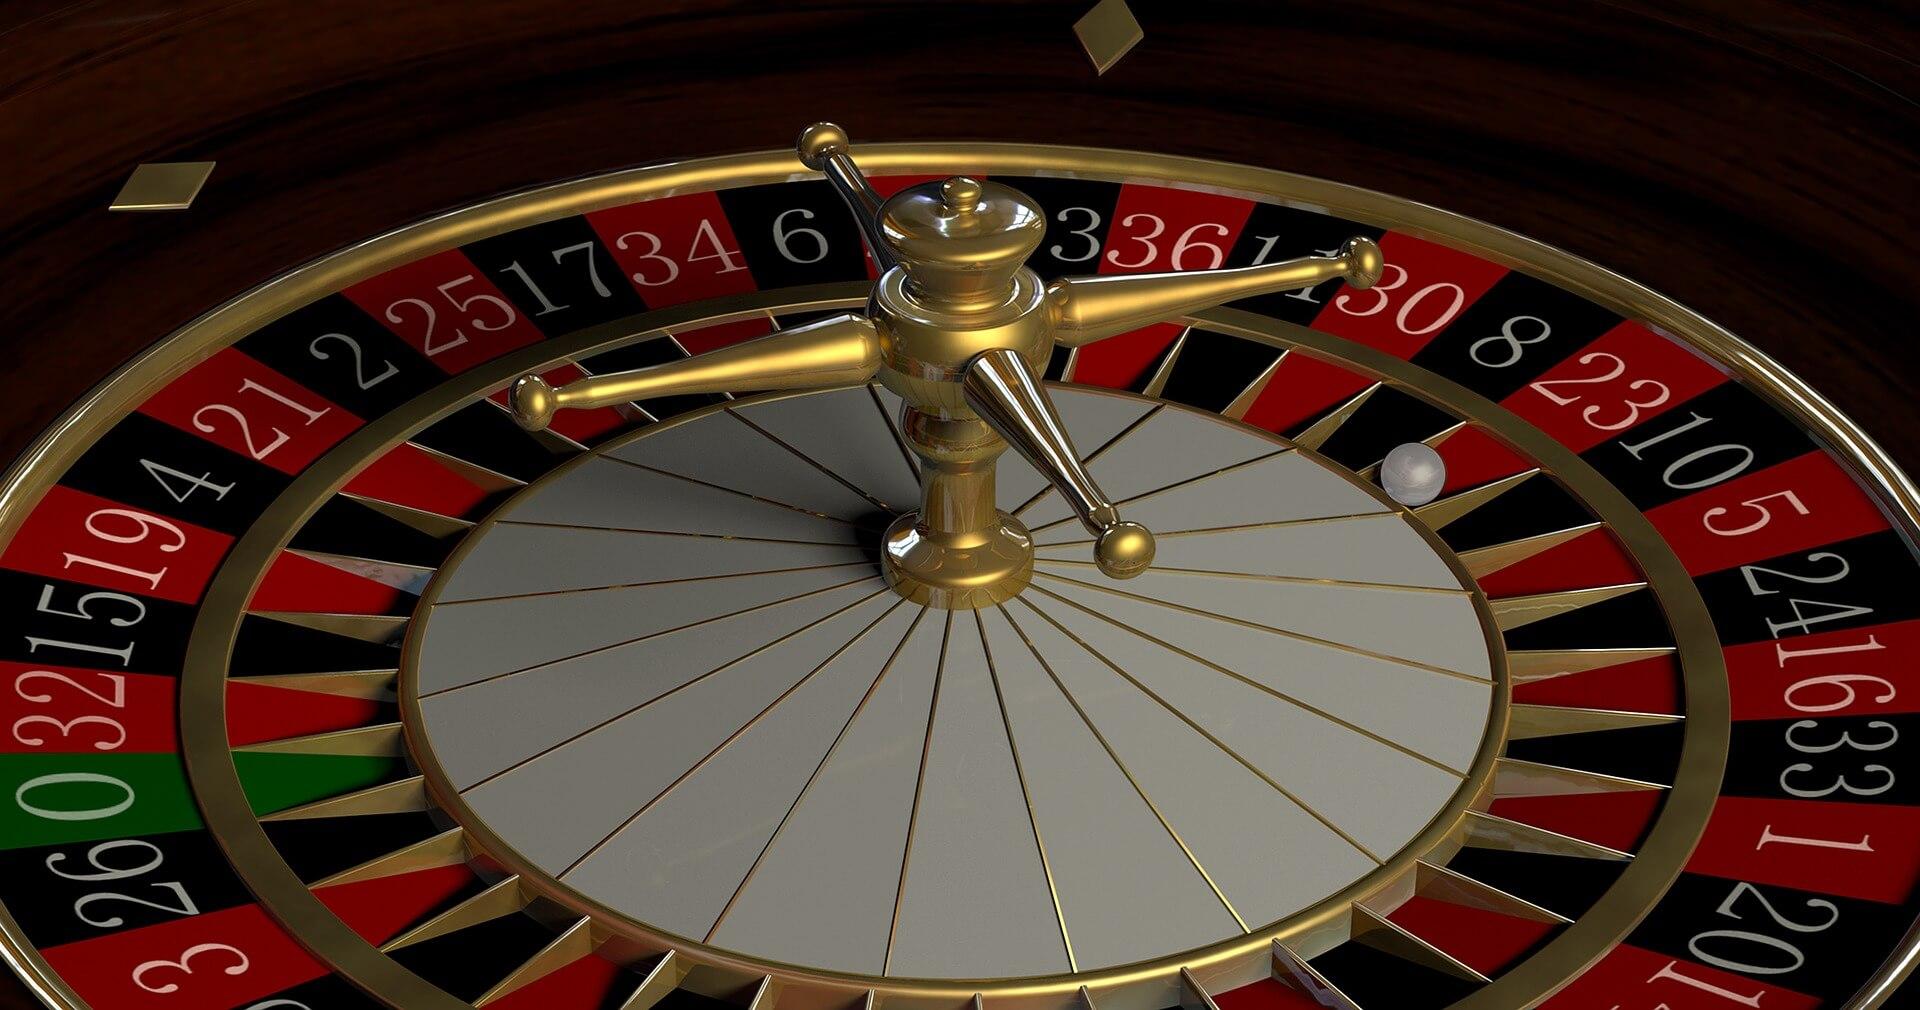 ¿Cómo jugar a la Ruleta en Zamba.co?